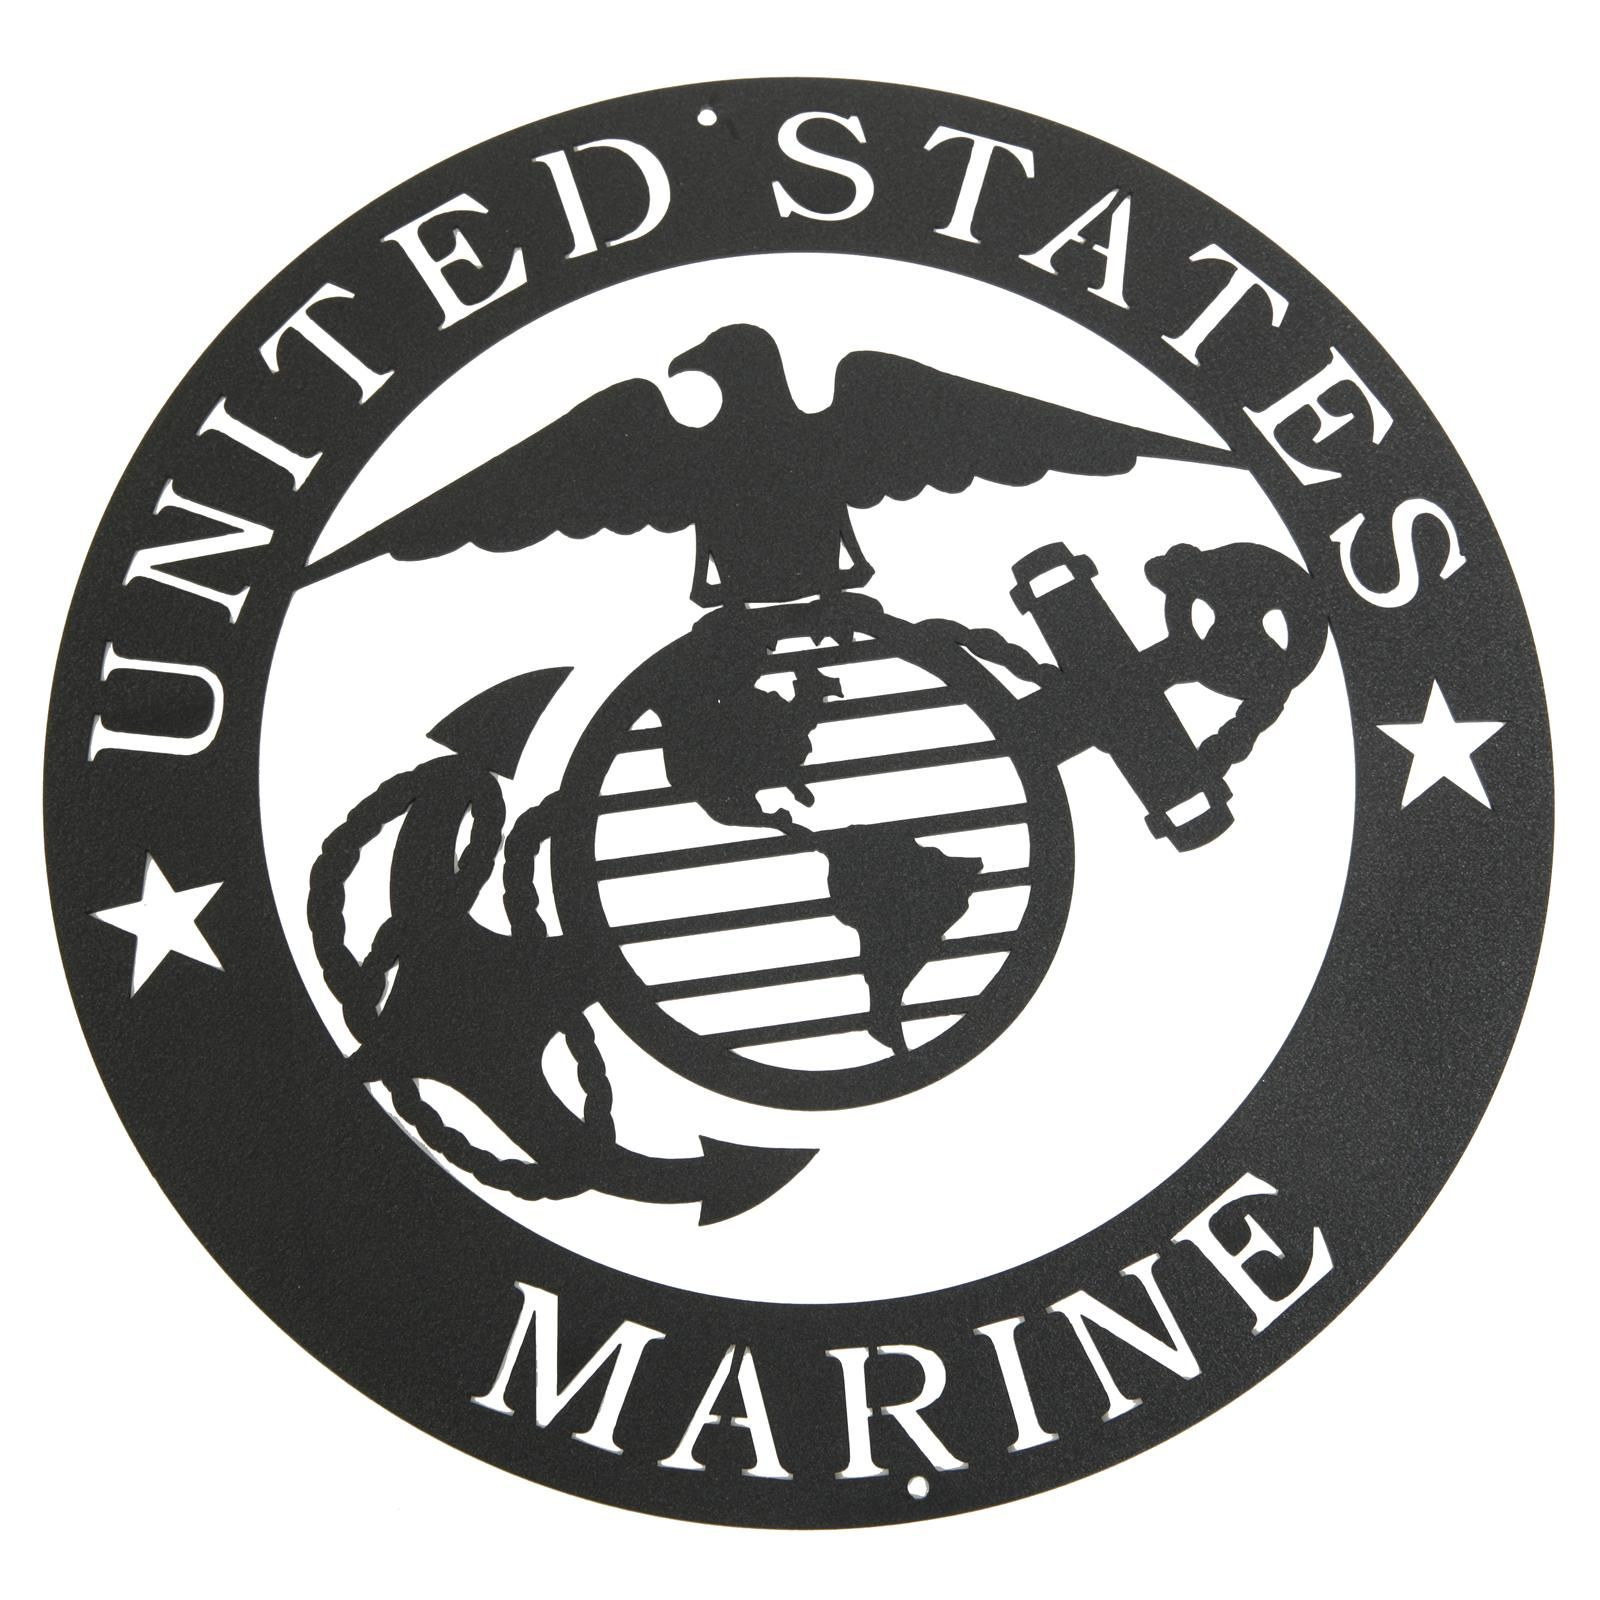 Marines Corps Emblem Metal Silhouette Marine Corps Emblem Semper